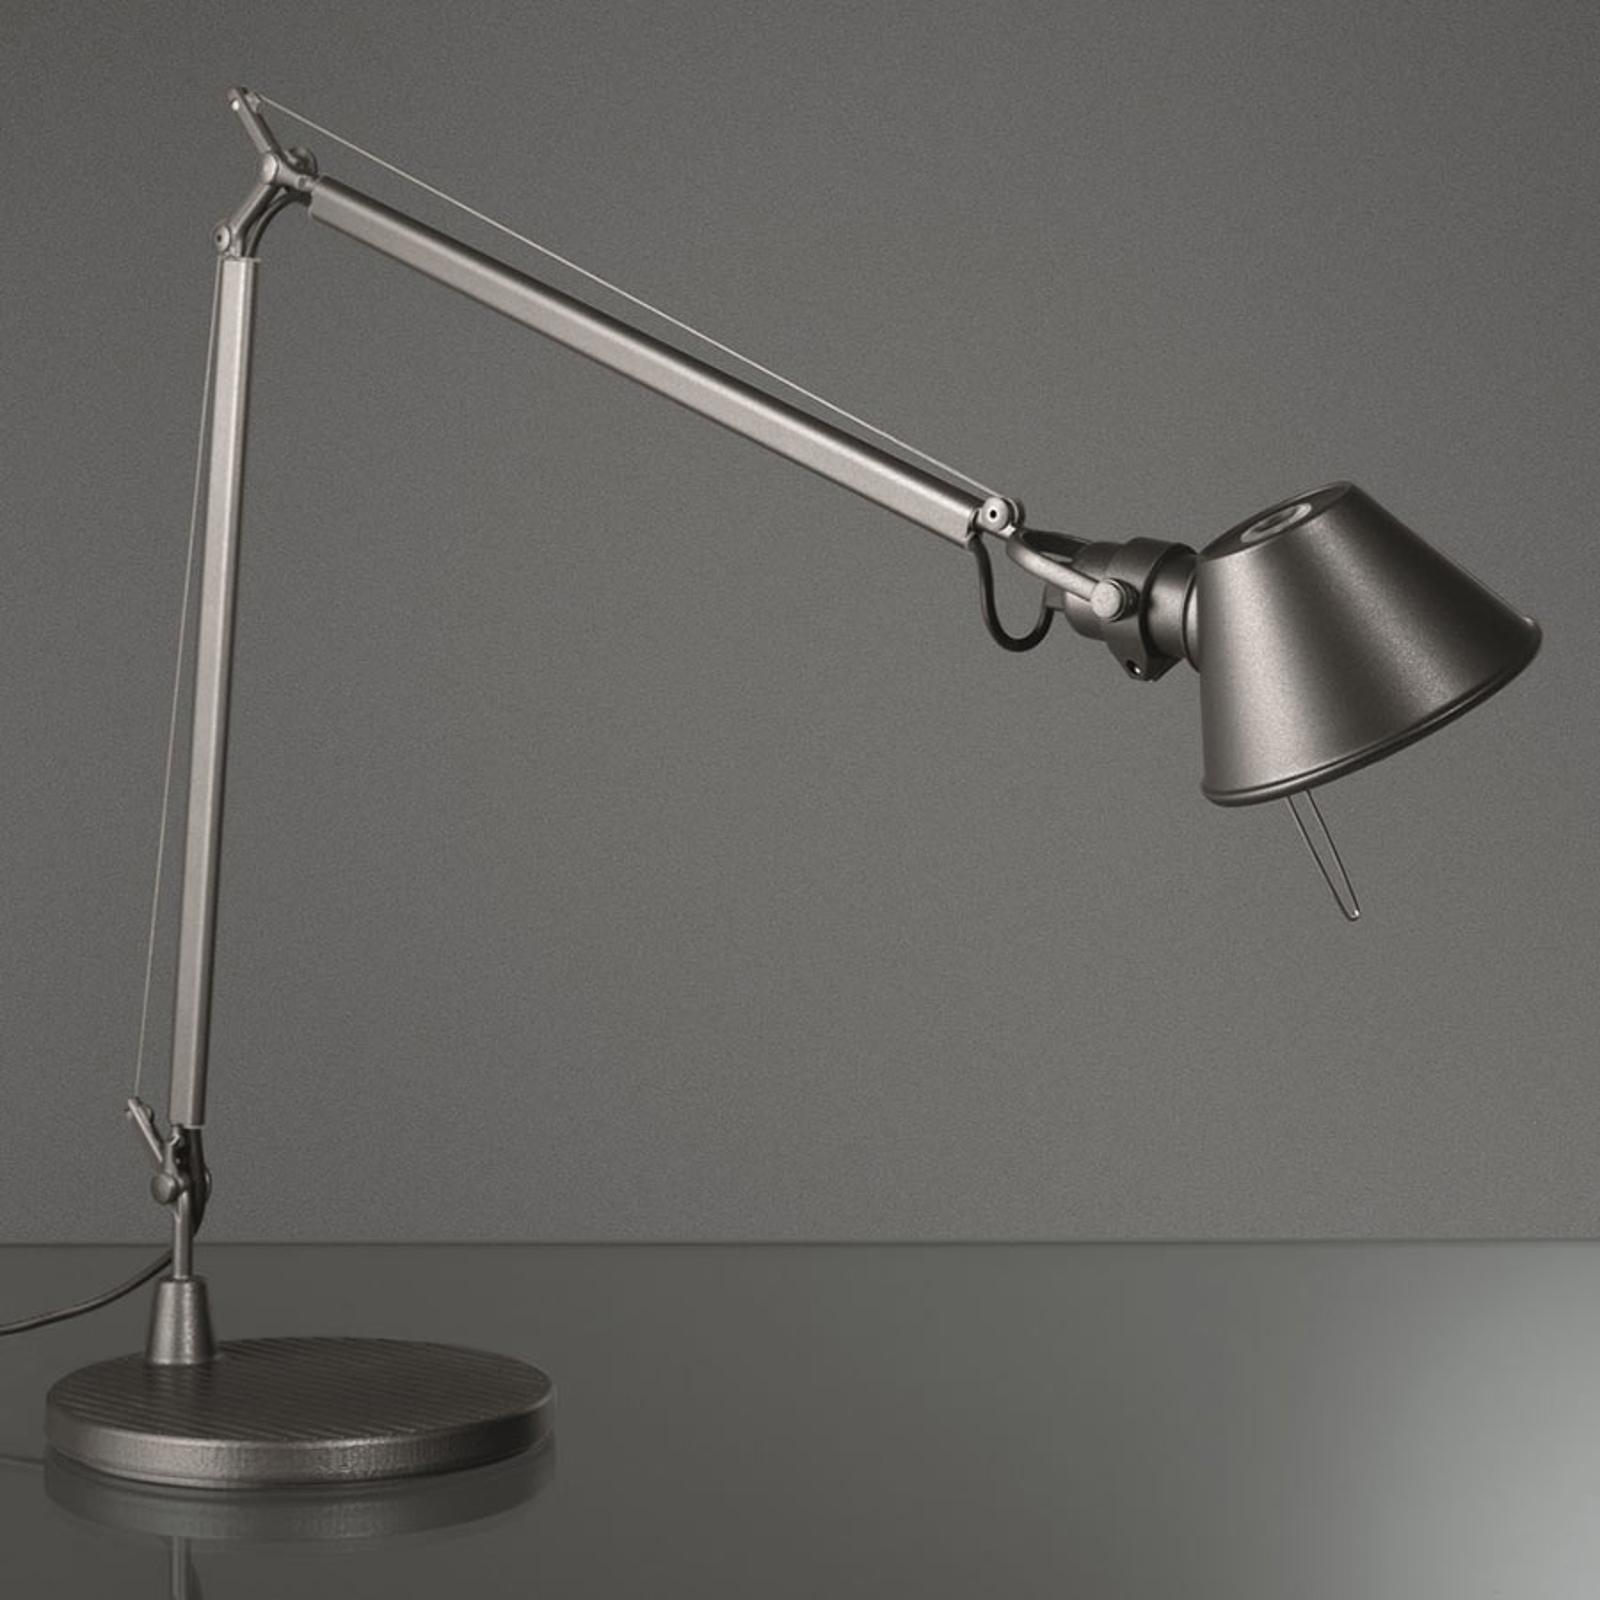 Artemide Tolomeo Midi lampa LED, 3000 K szara